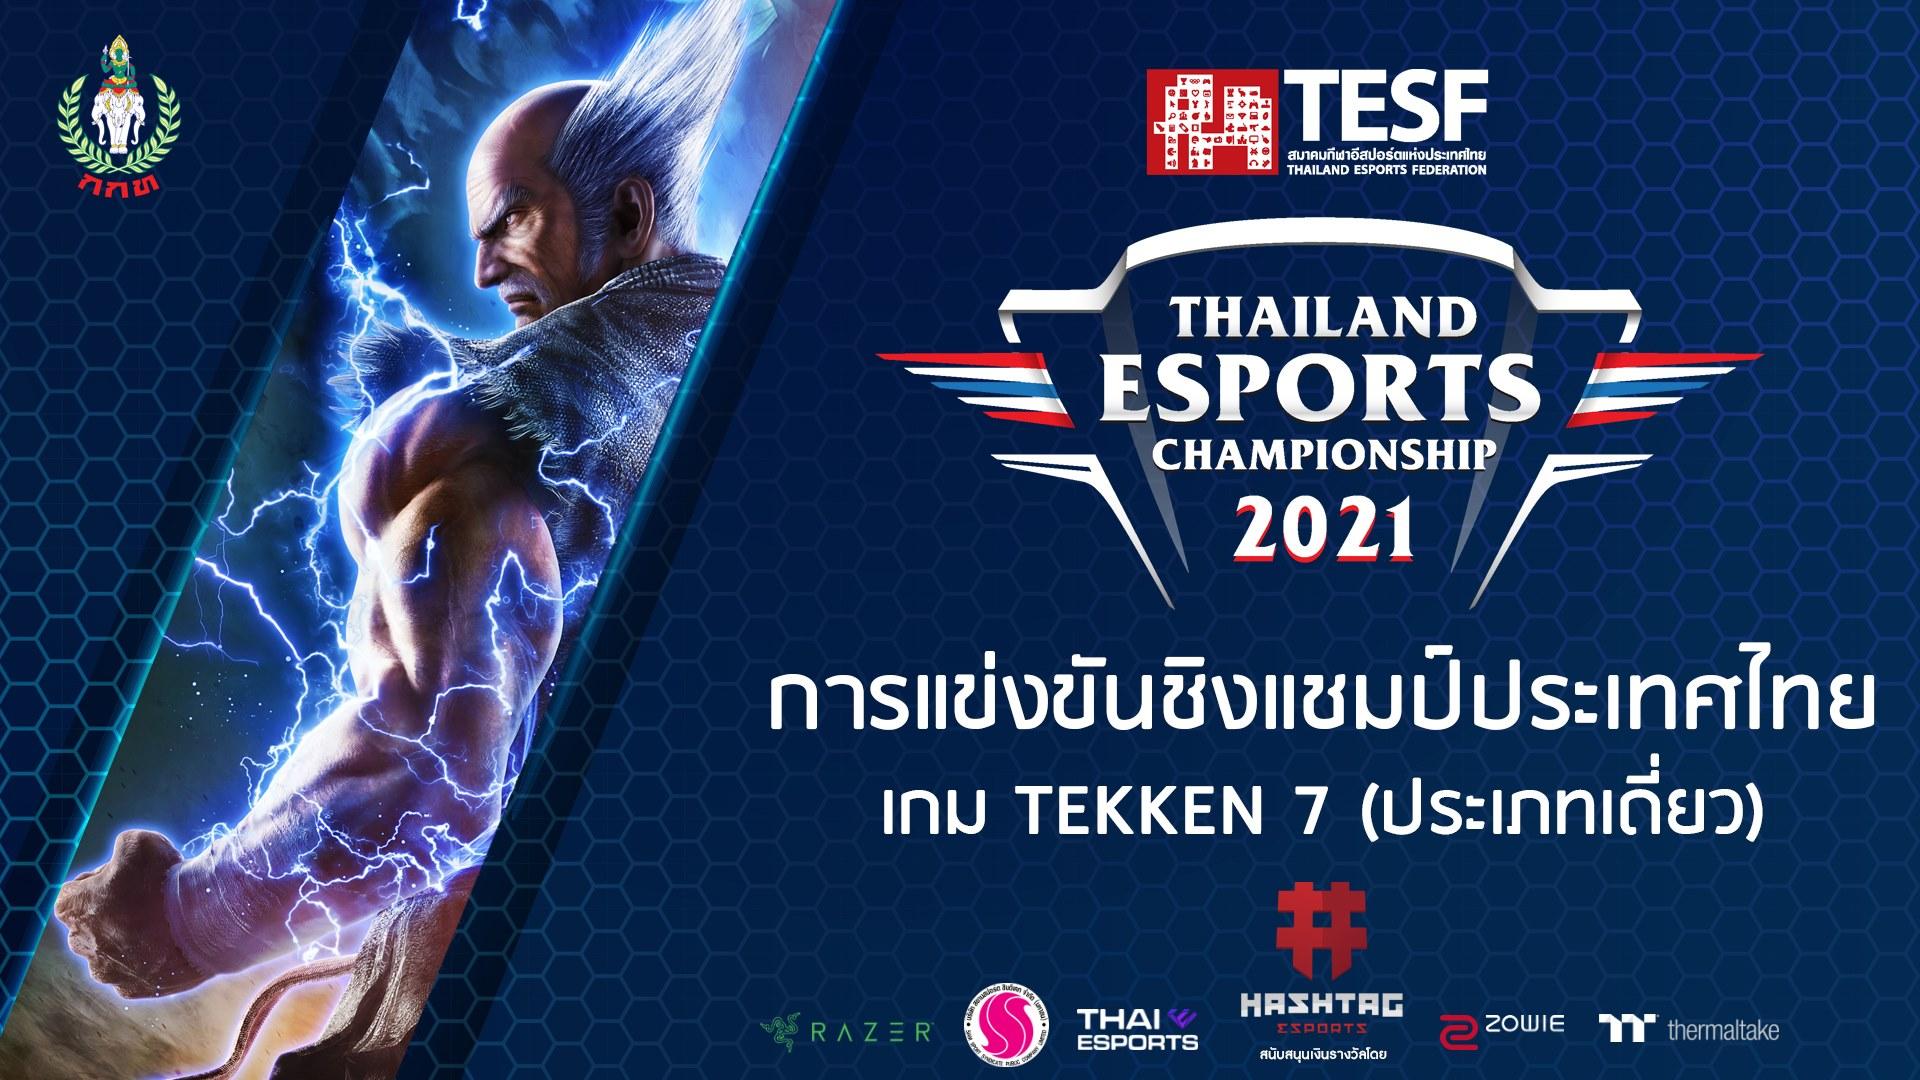 Thailand Esports 1082021 1